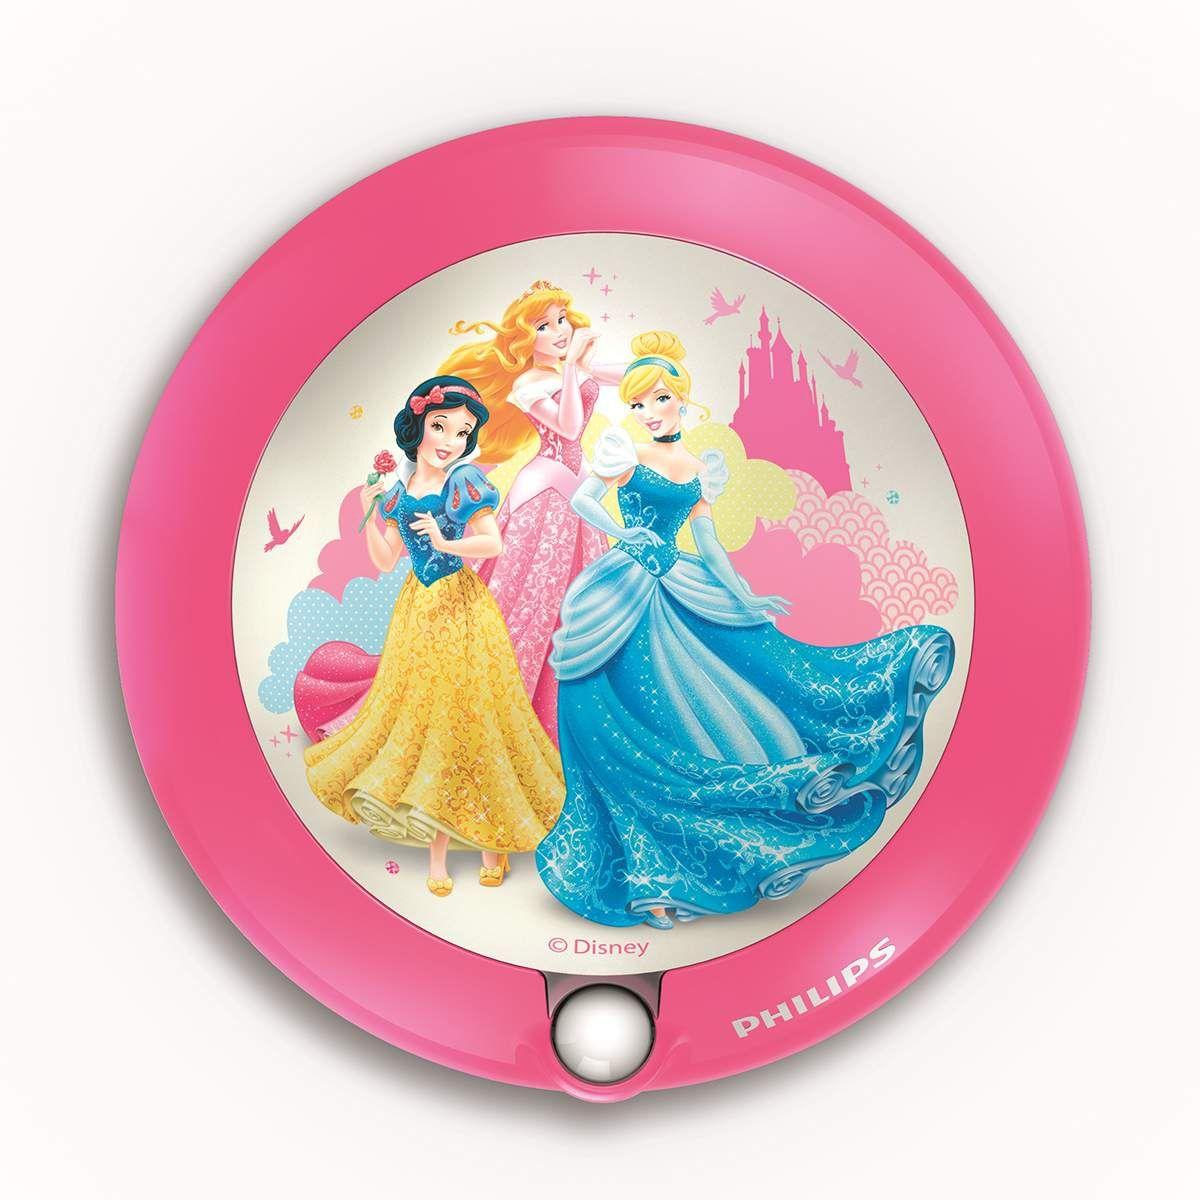 717602816 rosa Philips Disney LED Deckenleuchte Princess 4 W